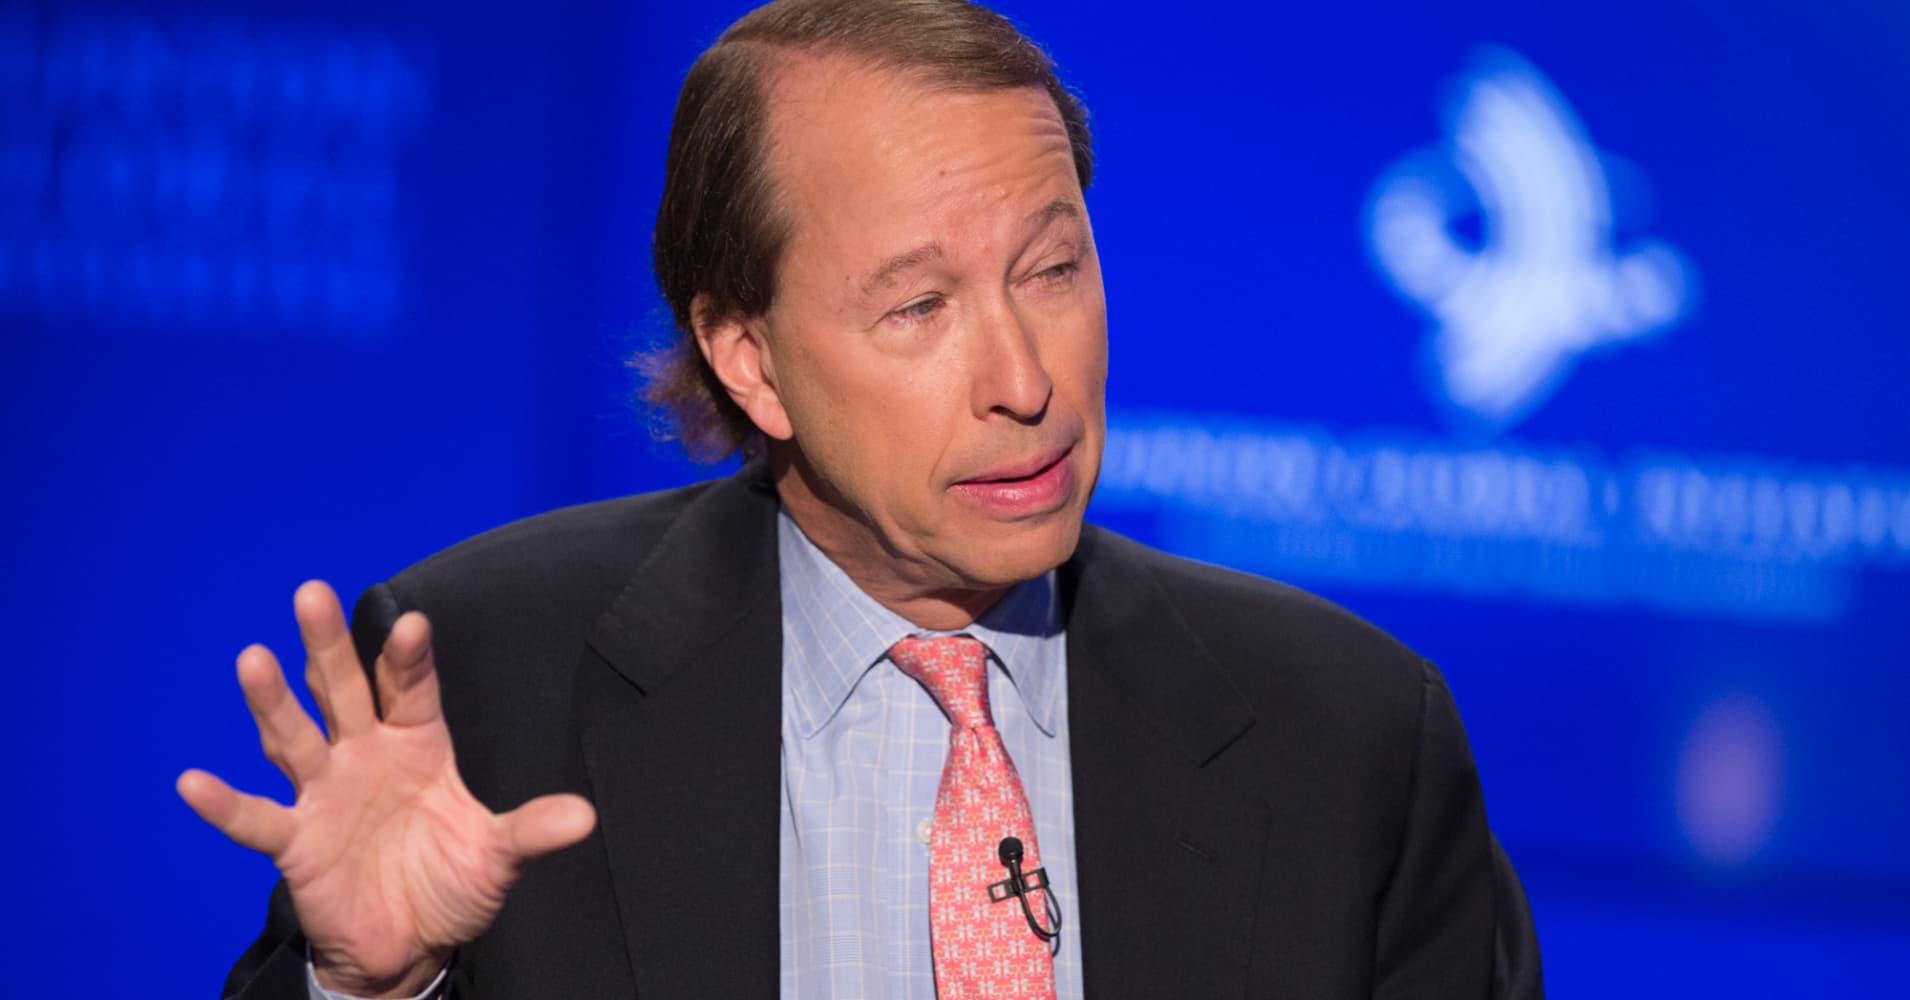 Blackstone's Tony James: I don't see an economic downturn anywhere on the horizon